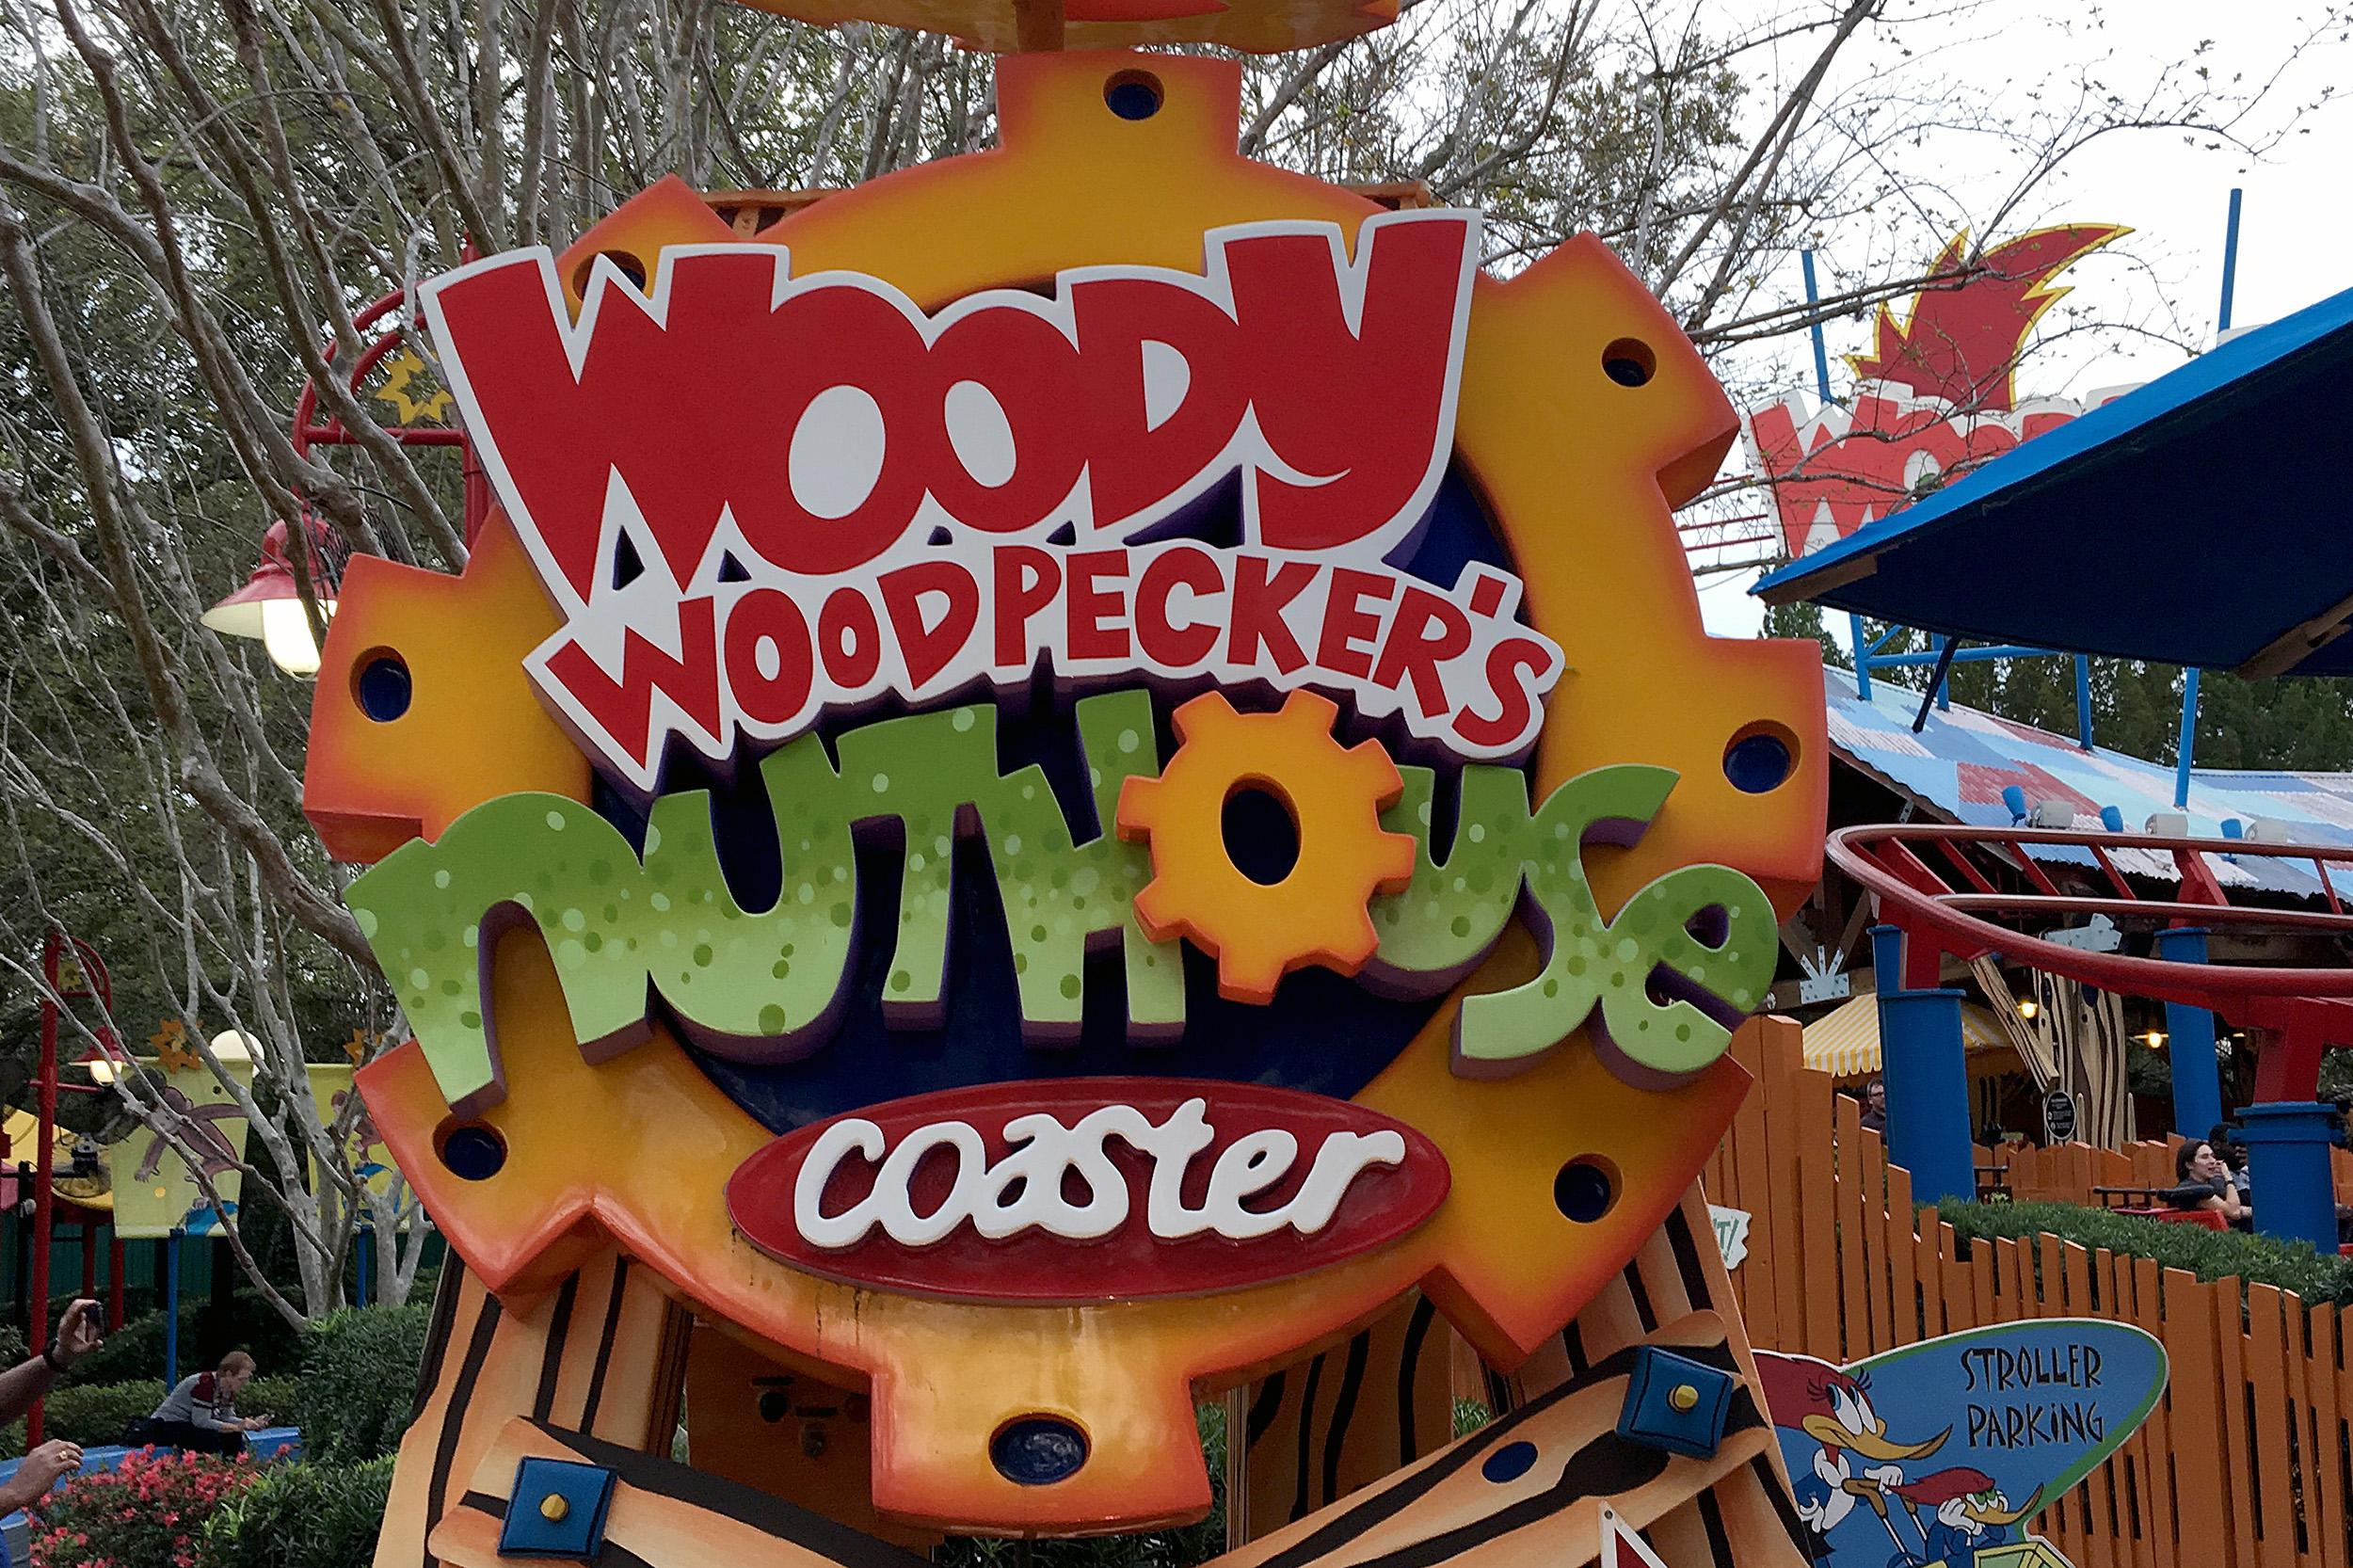 Woody Woodpeckers Coaster Universal Studios Florida Åkattraktioner